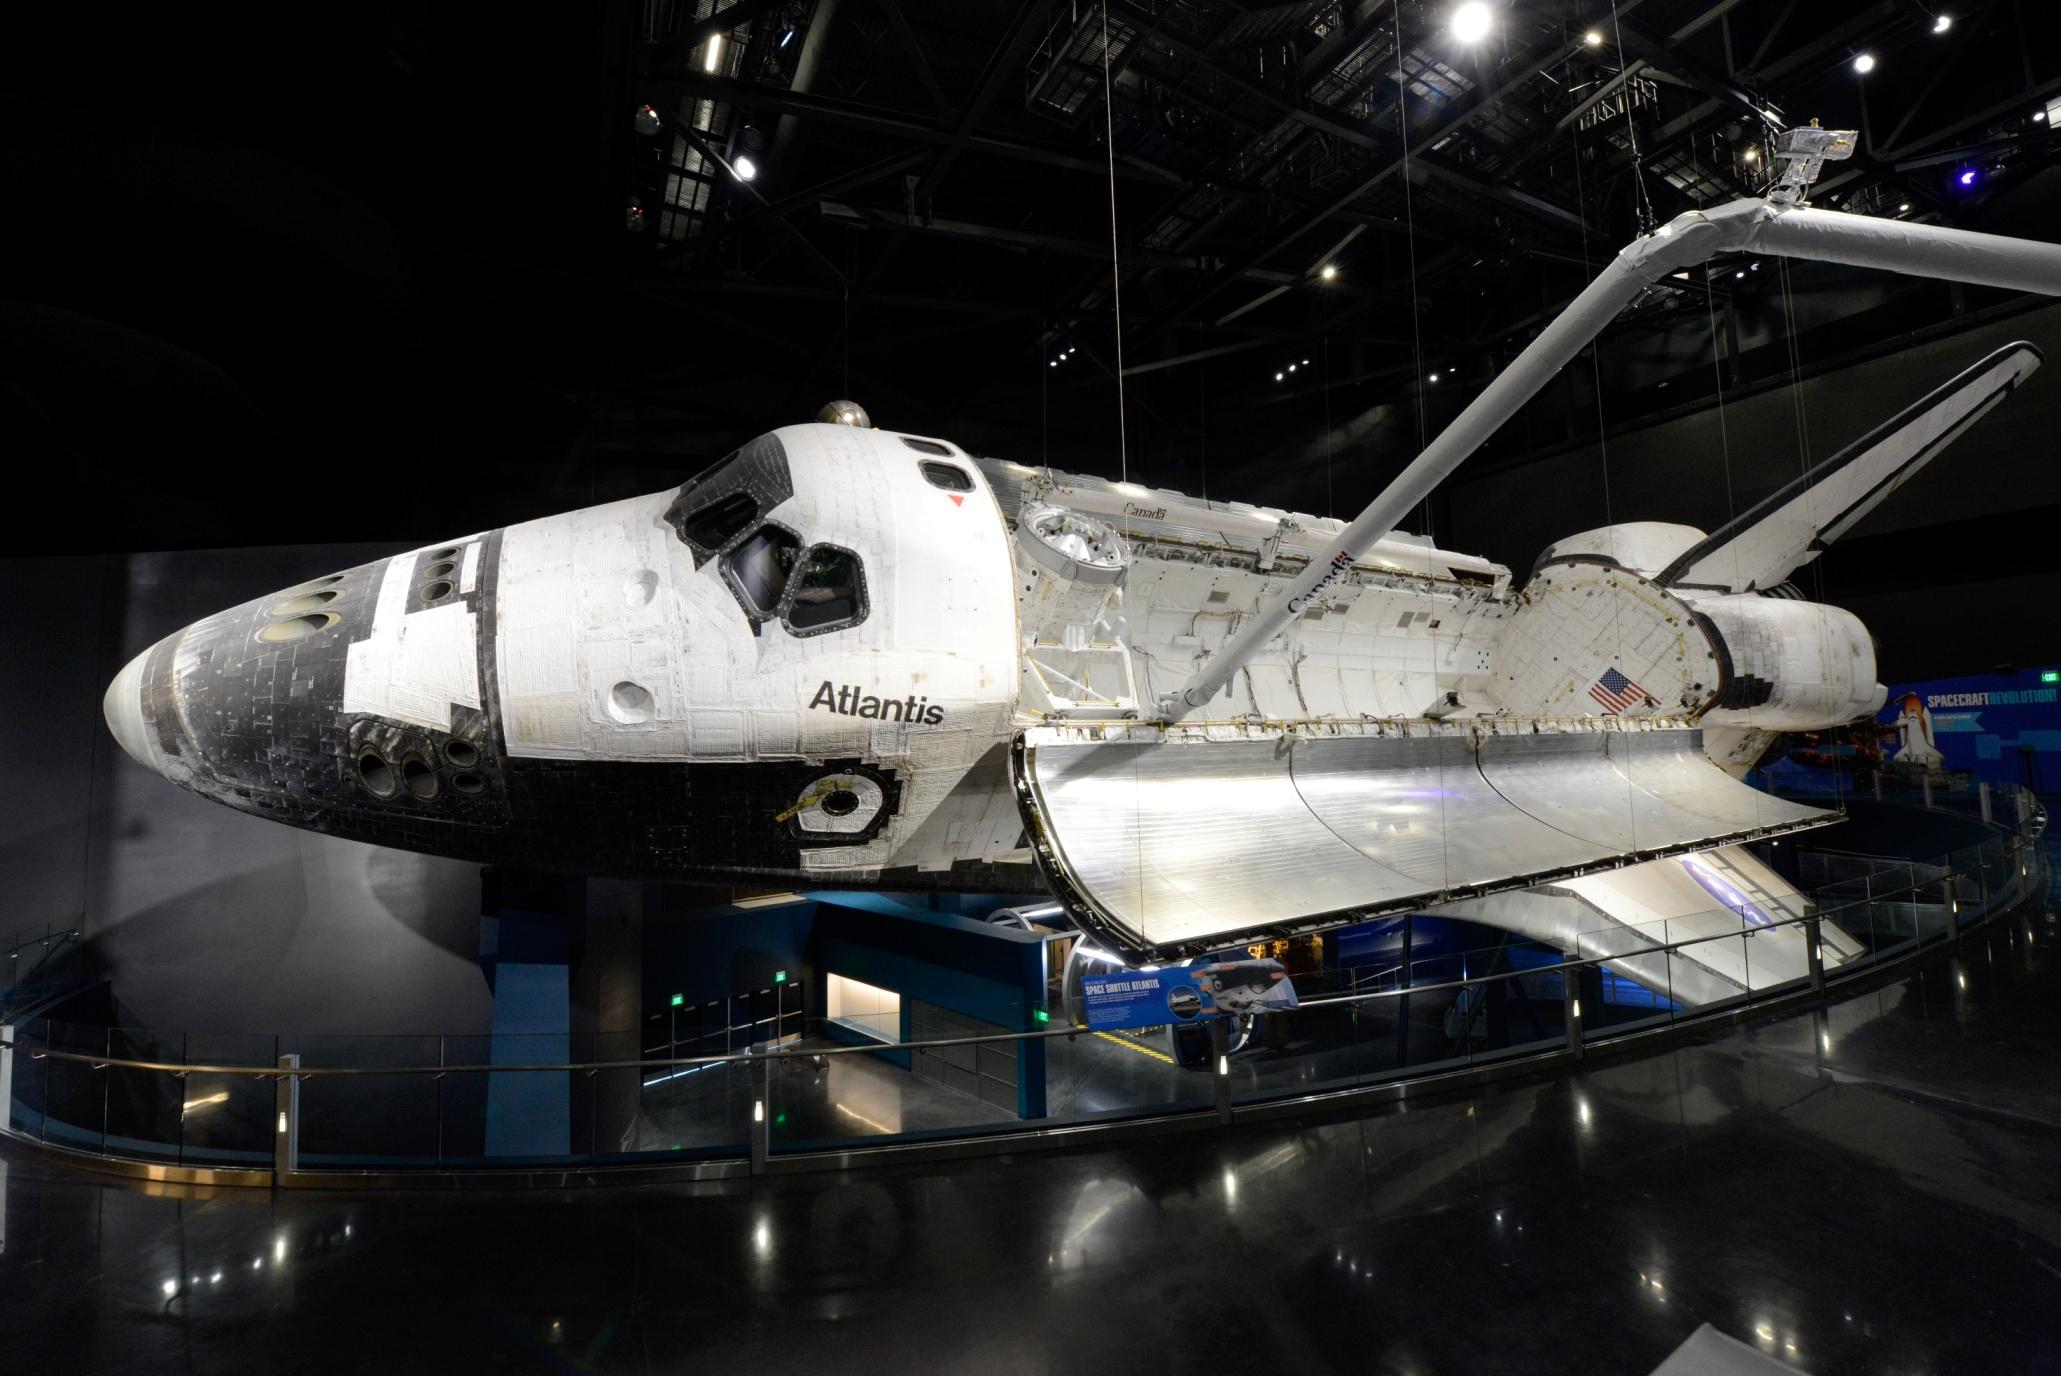 atlantis space shuttle di - photo #48